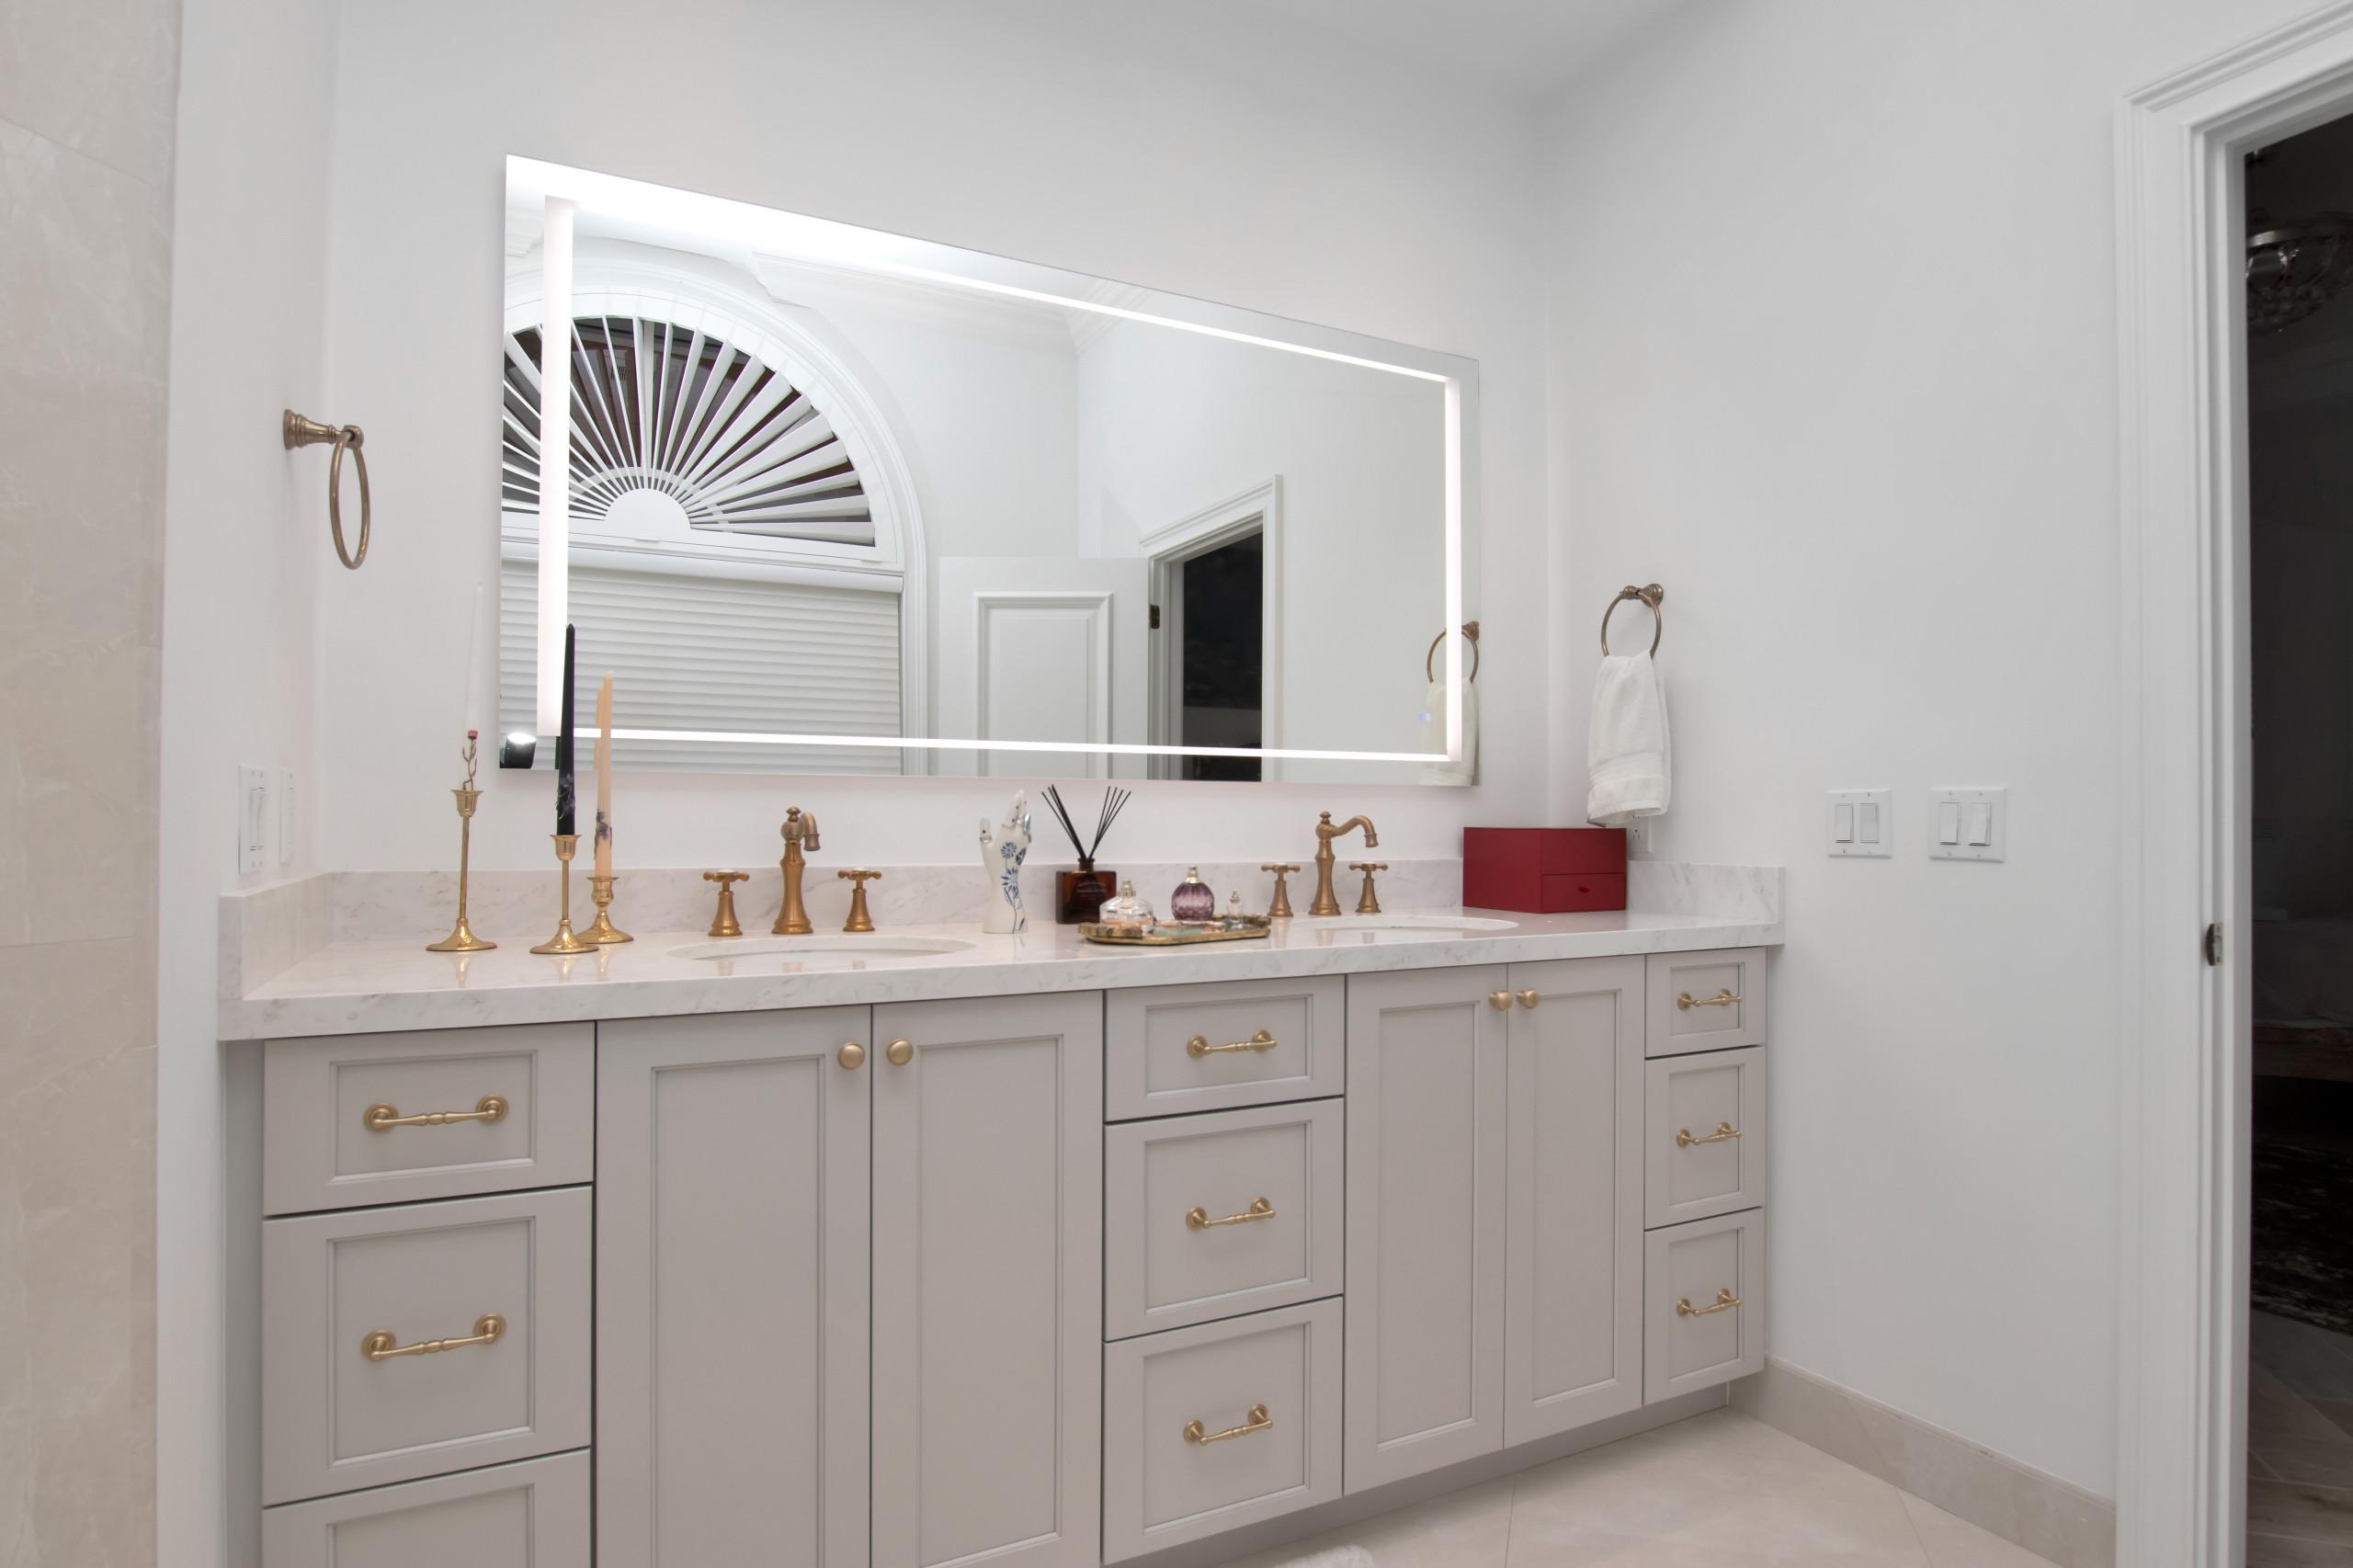 Islamorada Kitchen and Bath Remodel